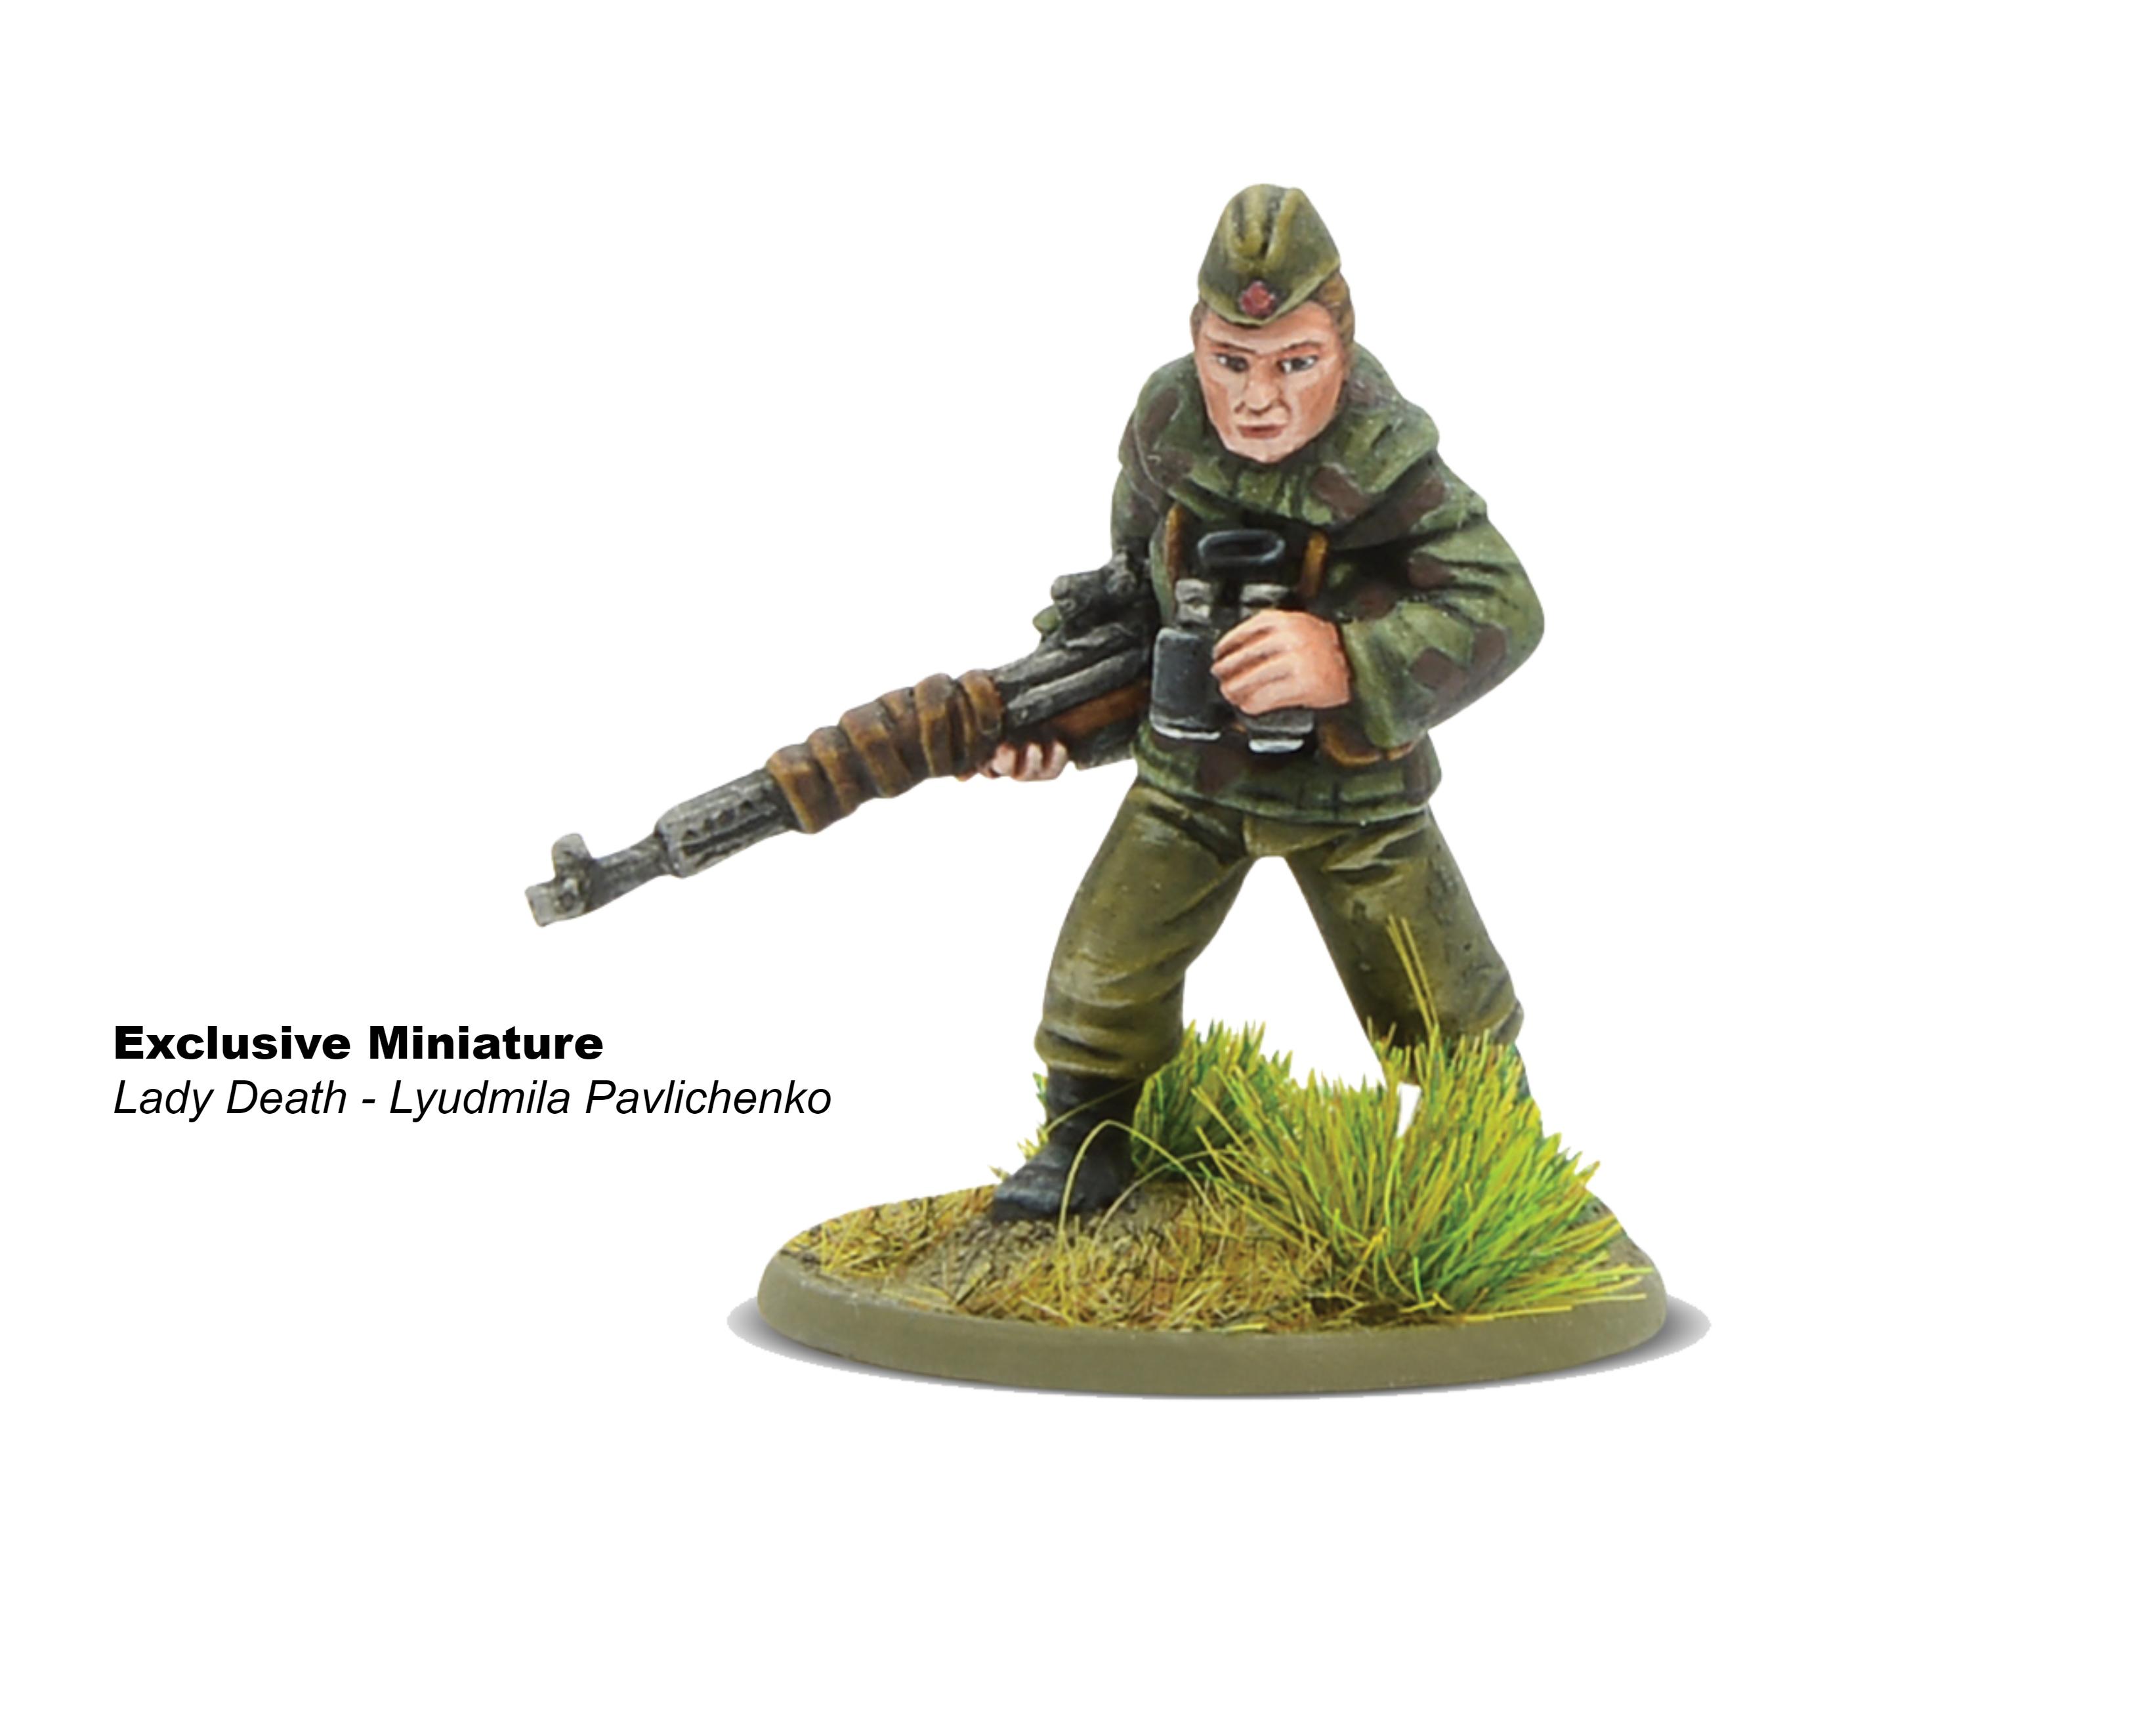 Bolt Action Lady Death - Lyudmila Pavlichenko Miniature